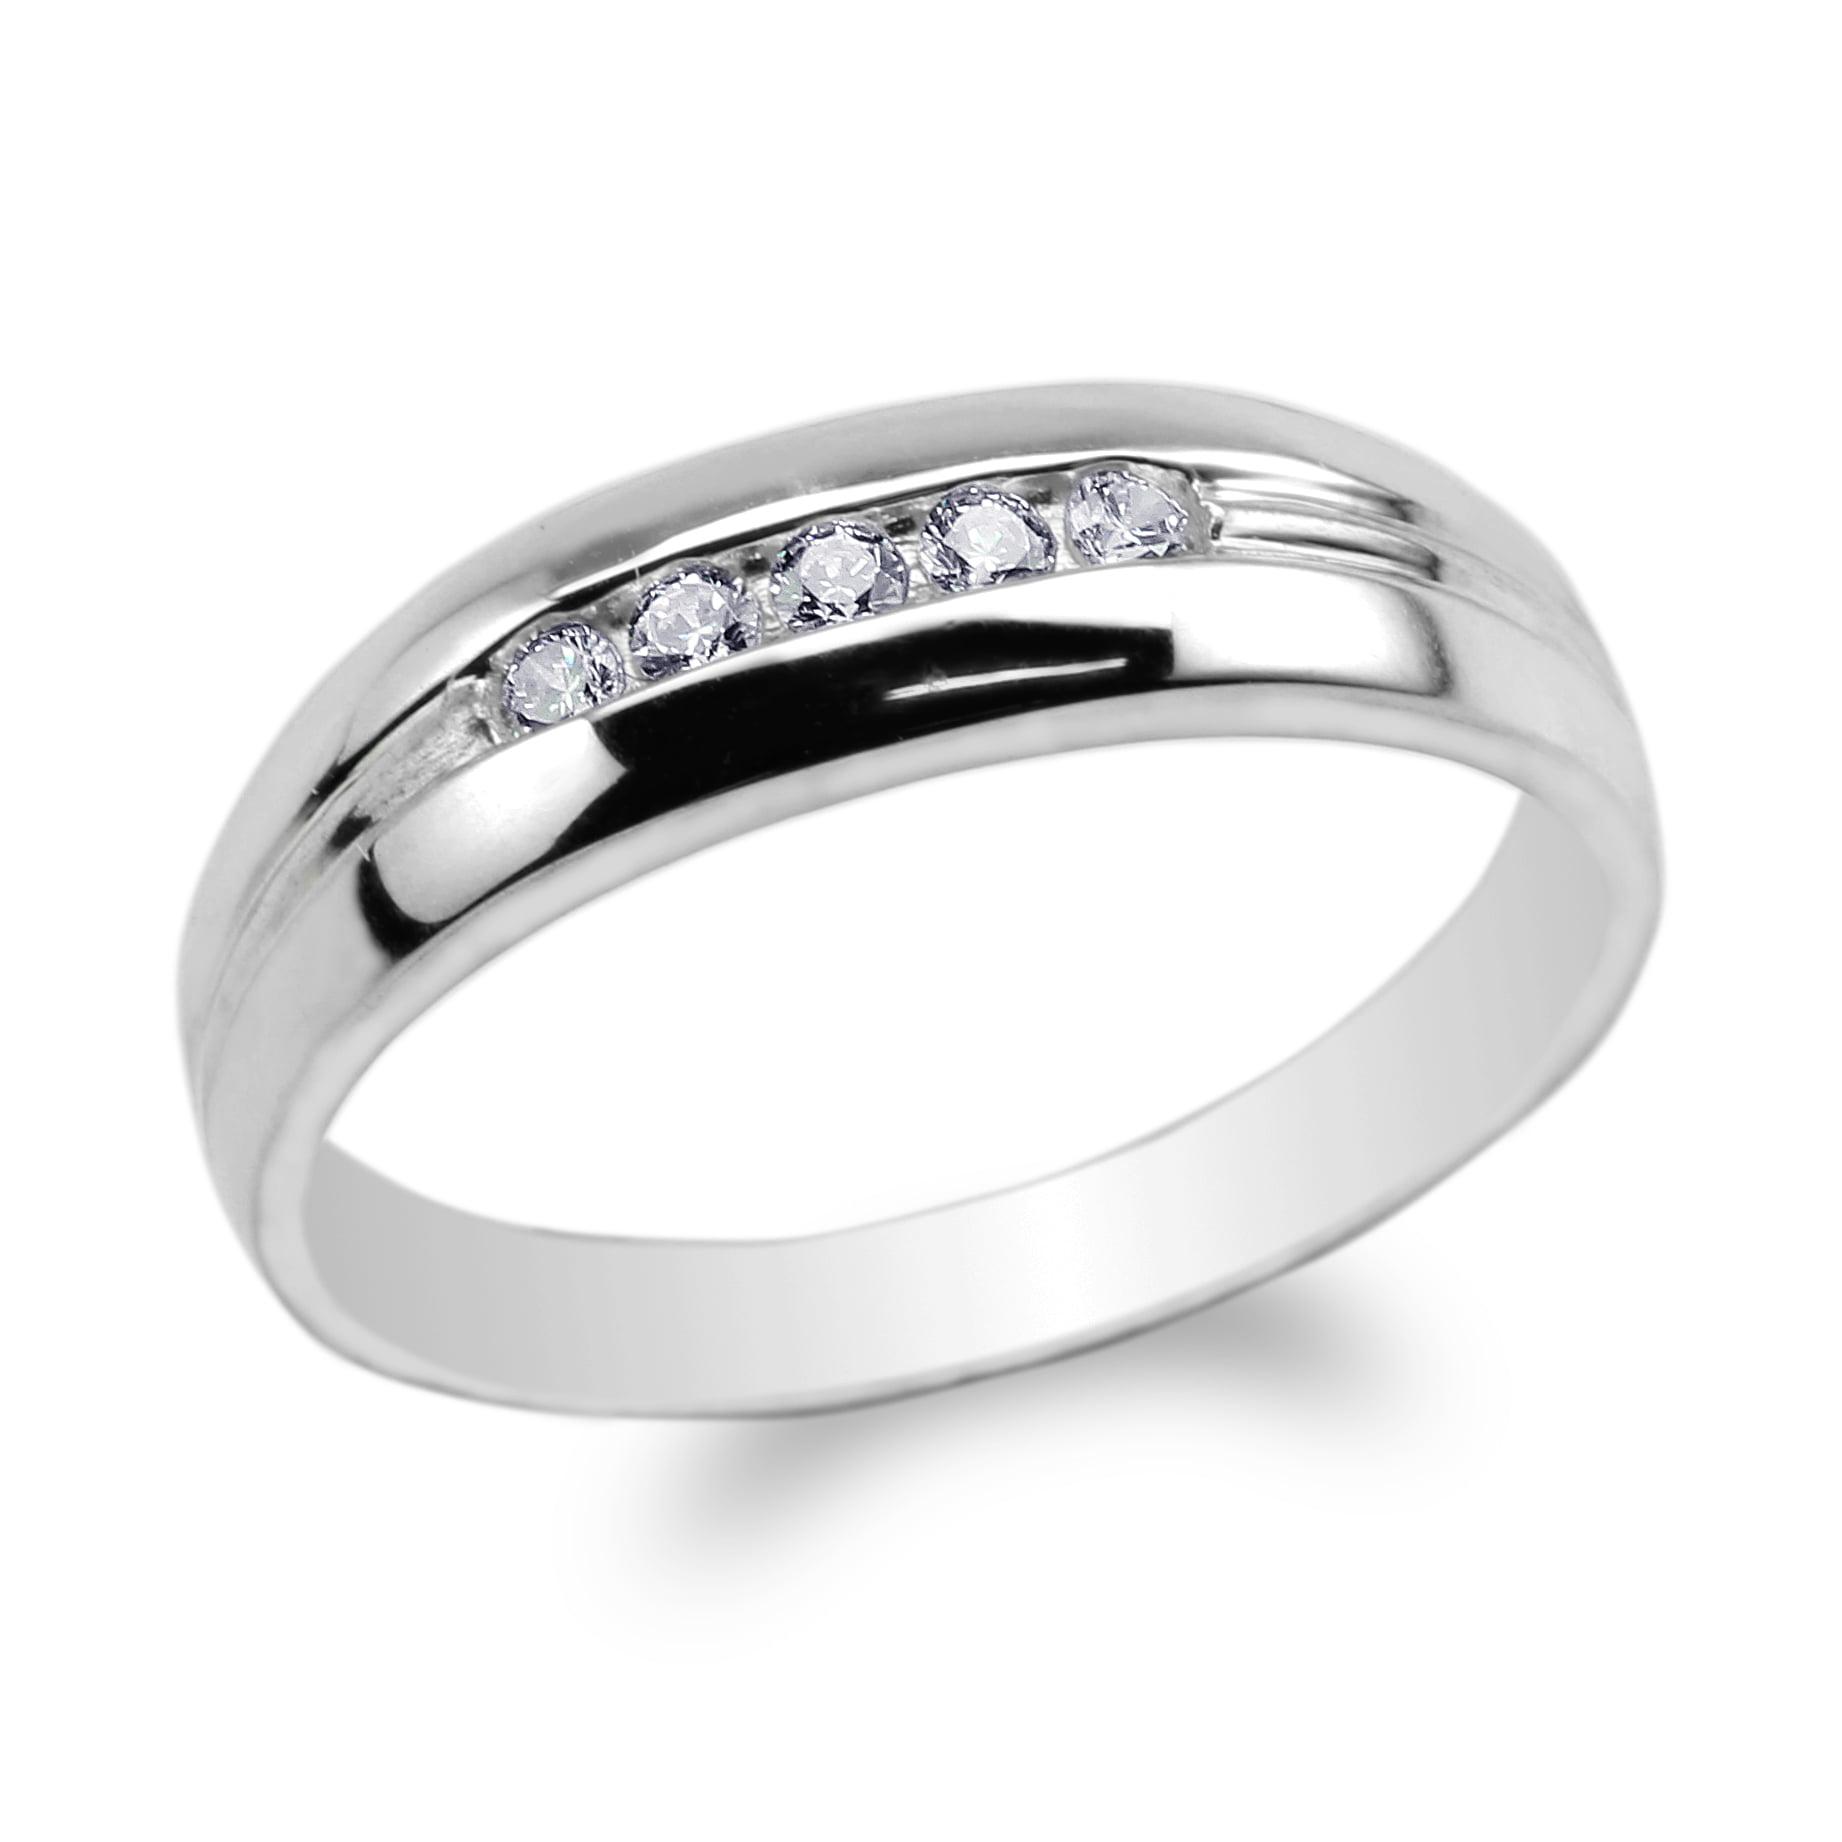 JamesJenny Ladies 10K White Gold 1.0ct Round CZ Beautiful Halo Ring Size 5-9